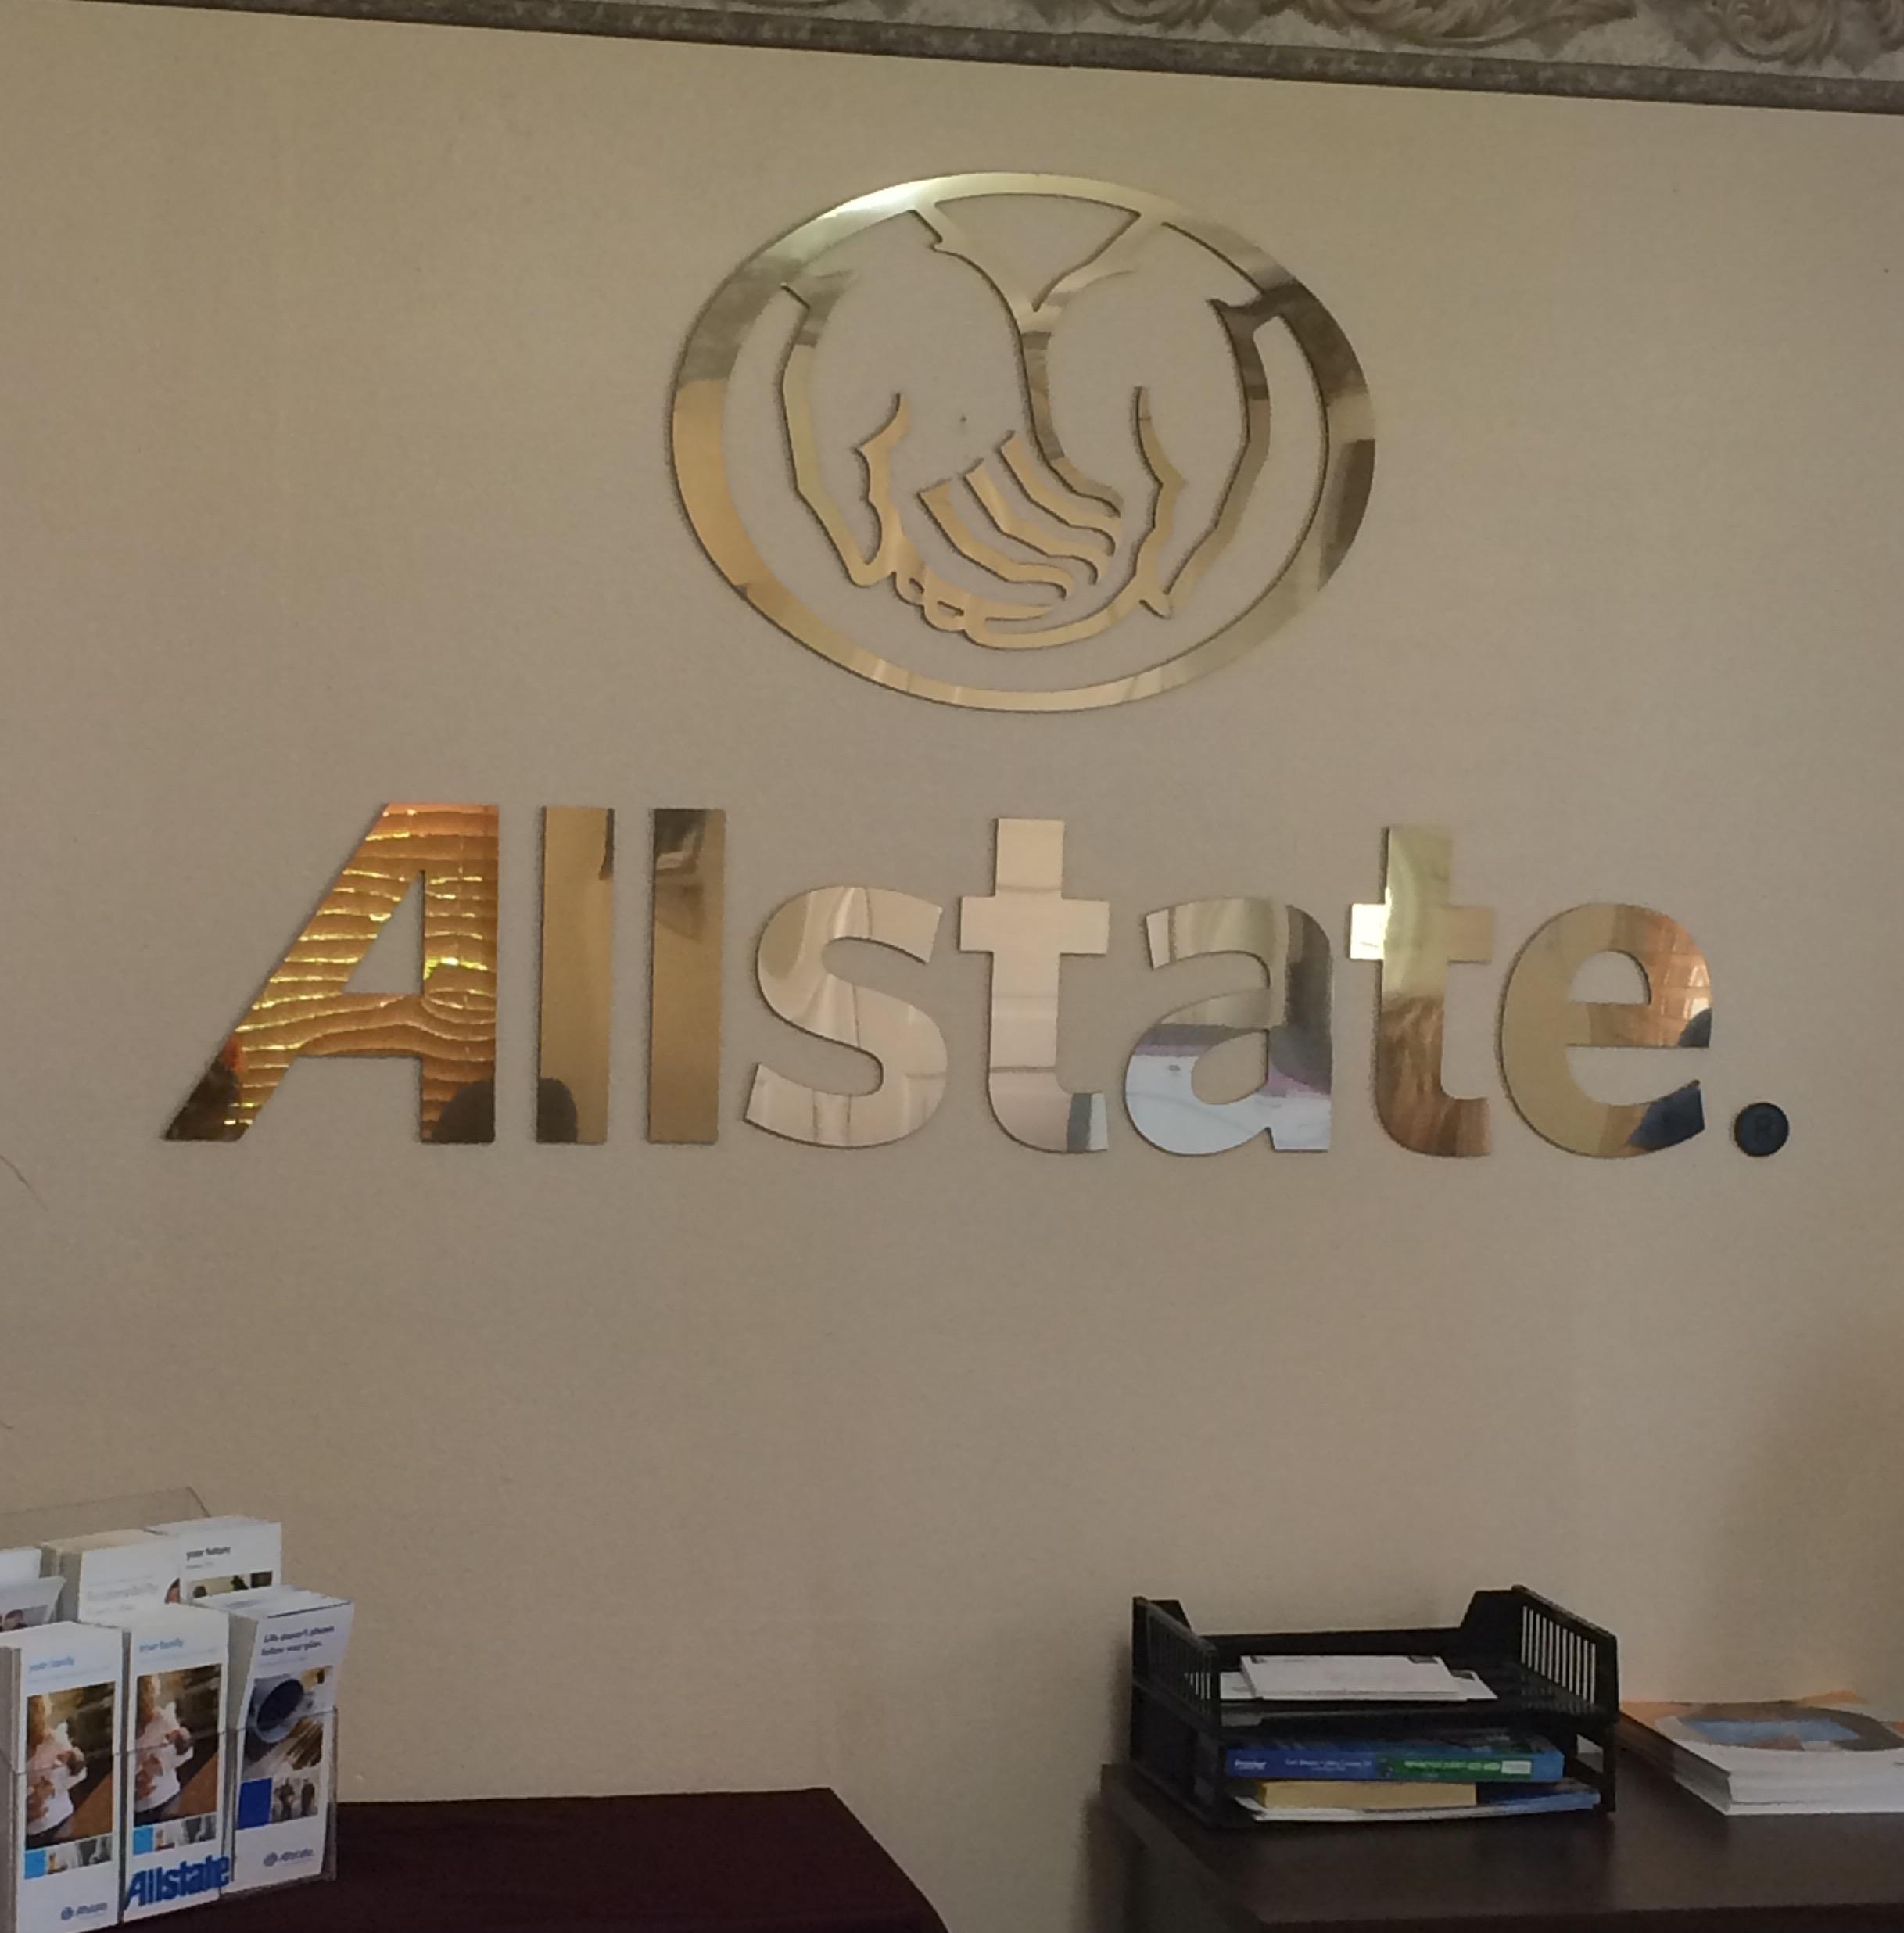 Kevin Gwozdz: Allstate Insurance image 6